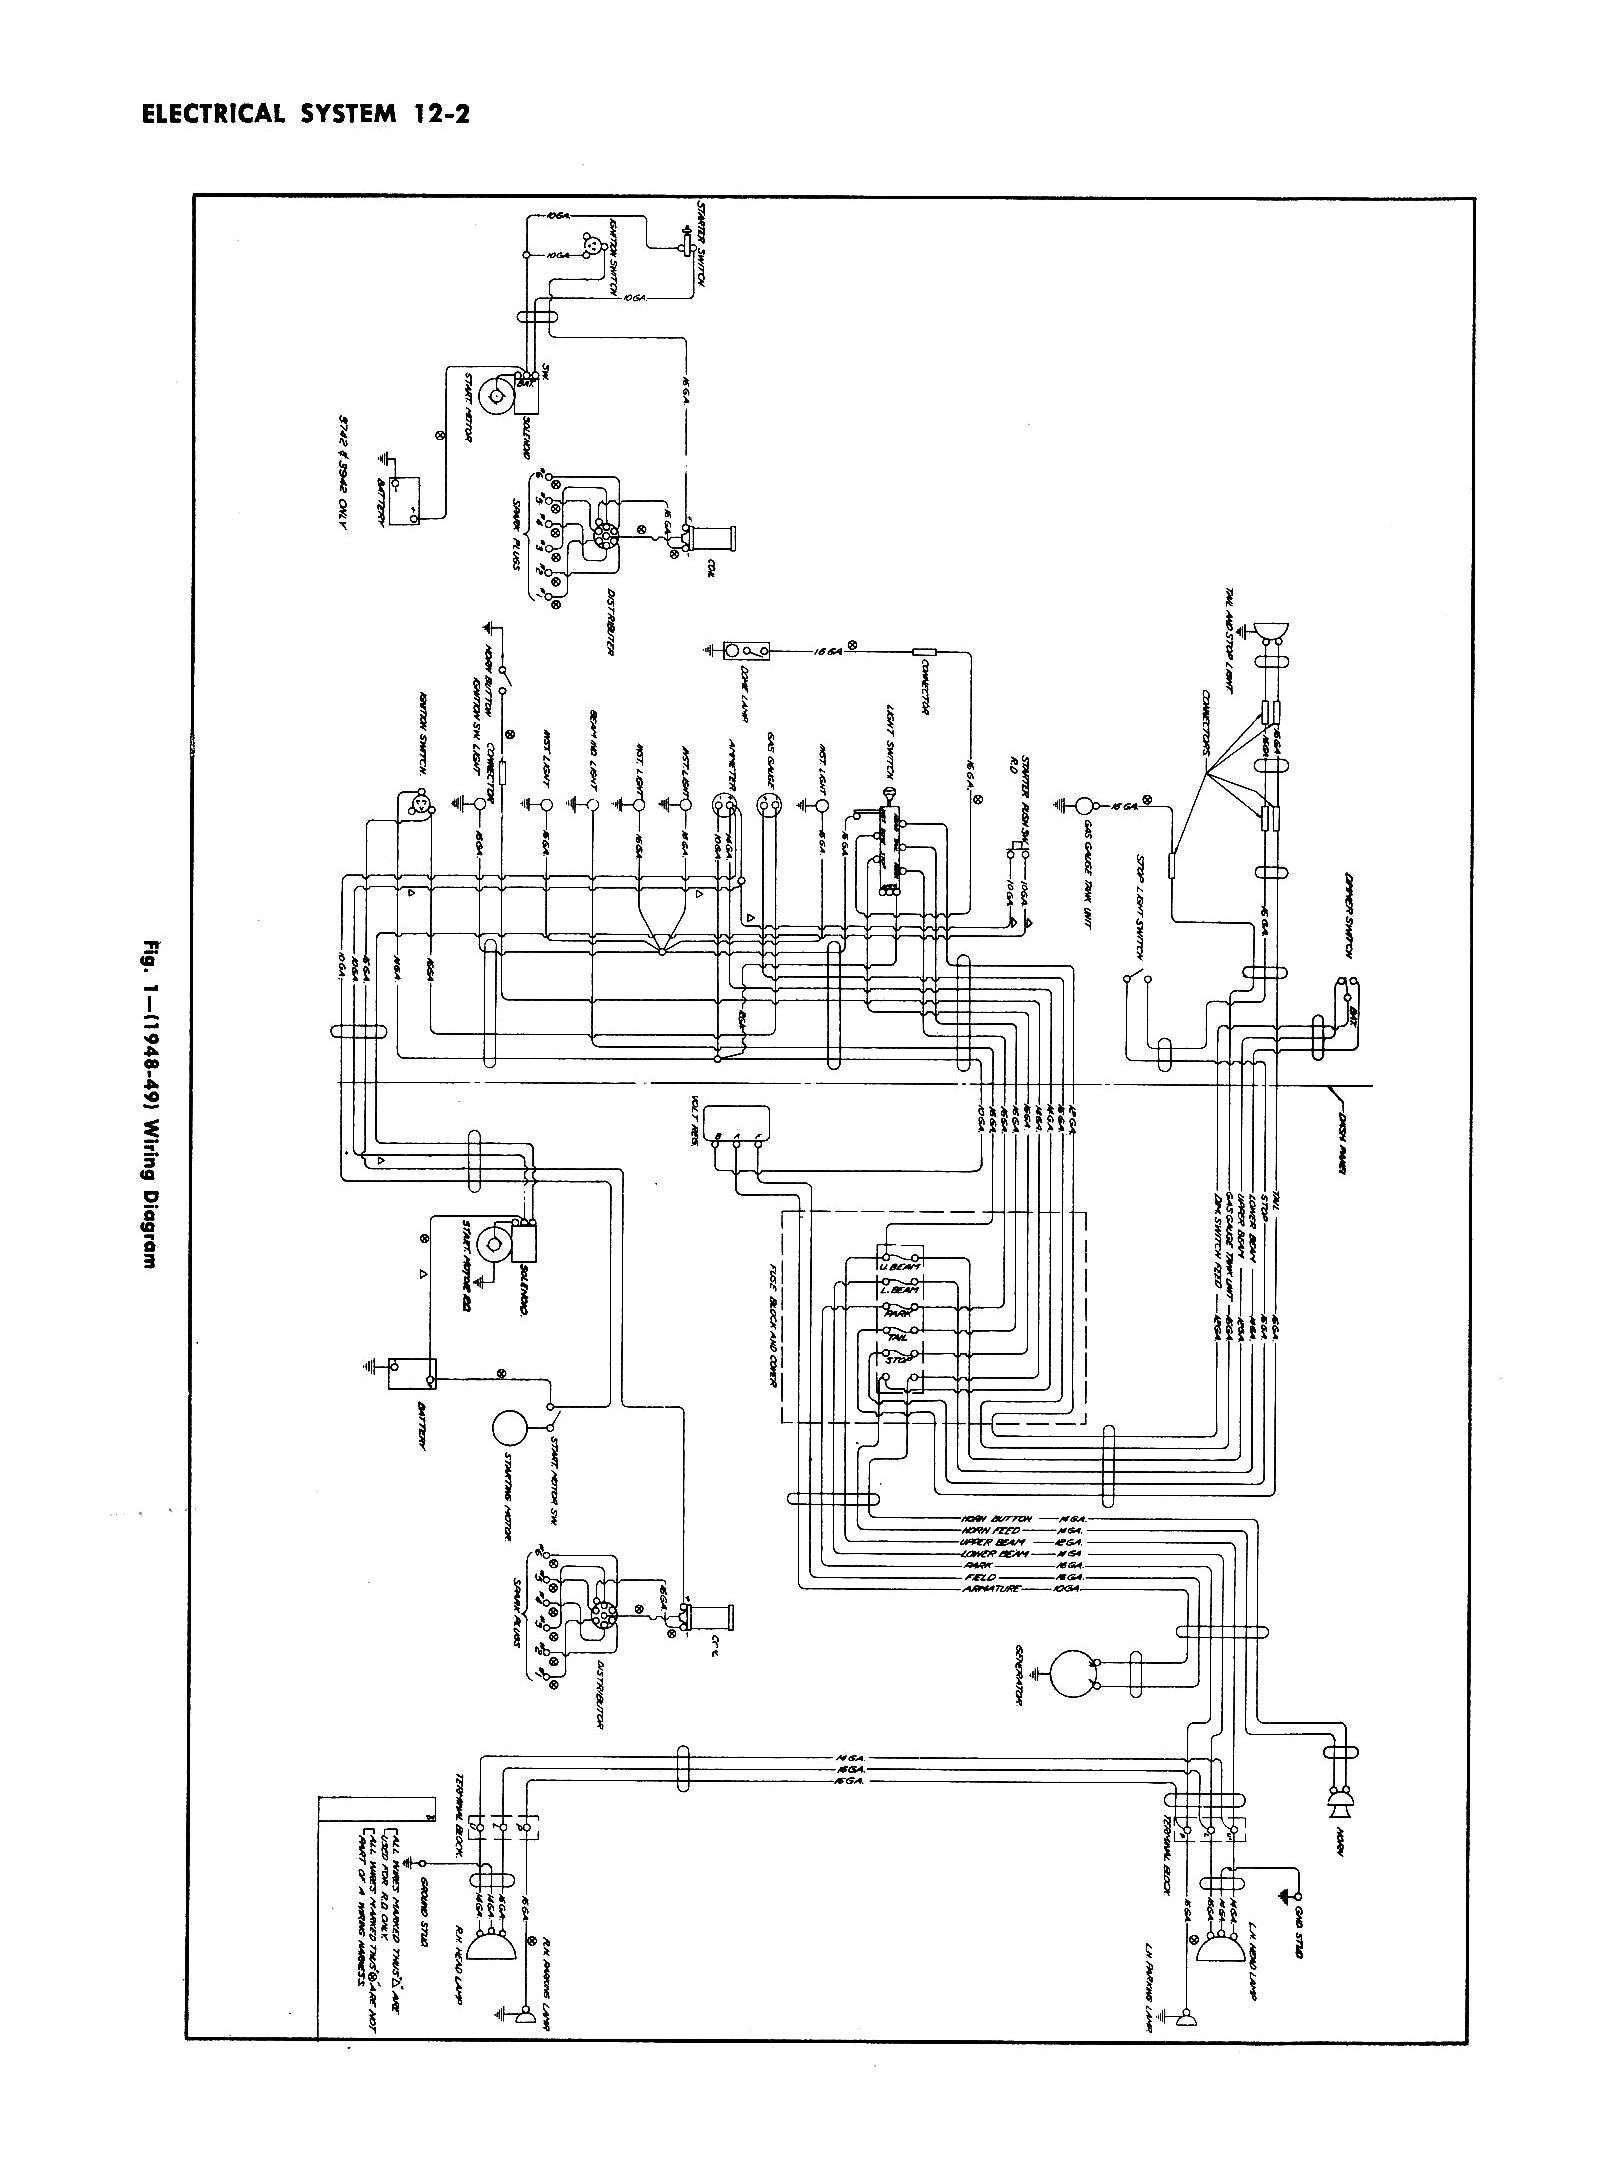 Wiring Diagram Cars Trucks Wiring Diagram Cars Trucks Truck Horn Wiring Wiring Diagrams Diagram 2004 Chevy Silverado Electrical Wiring Diagram